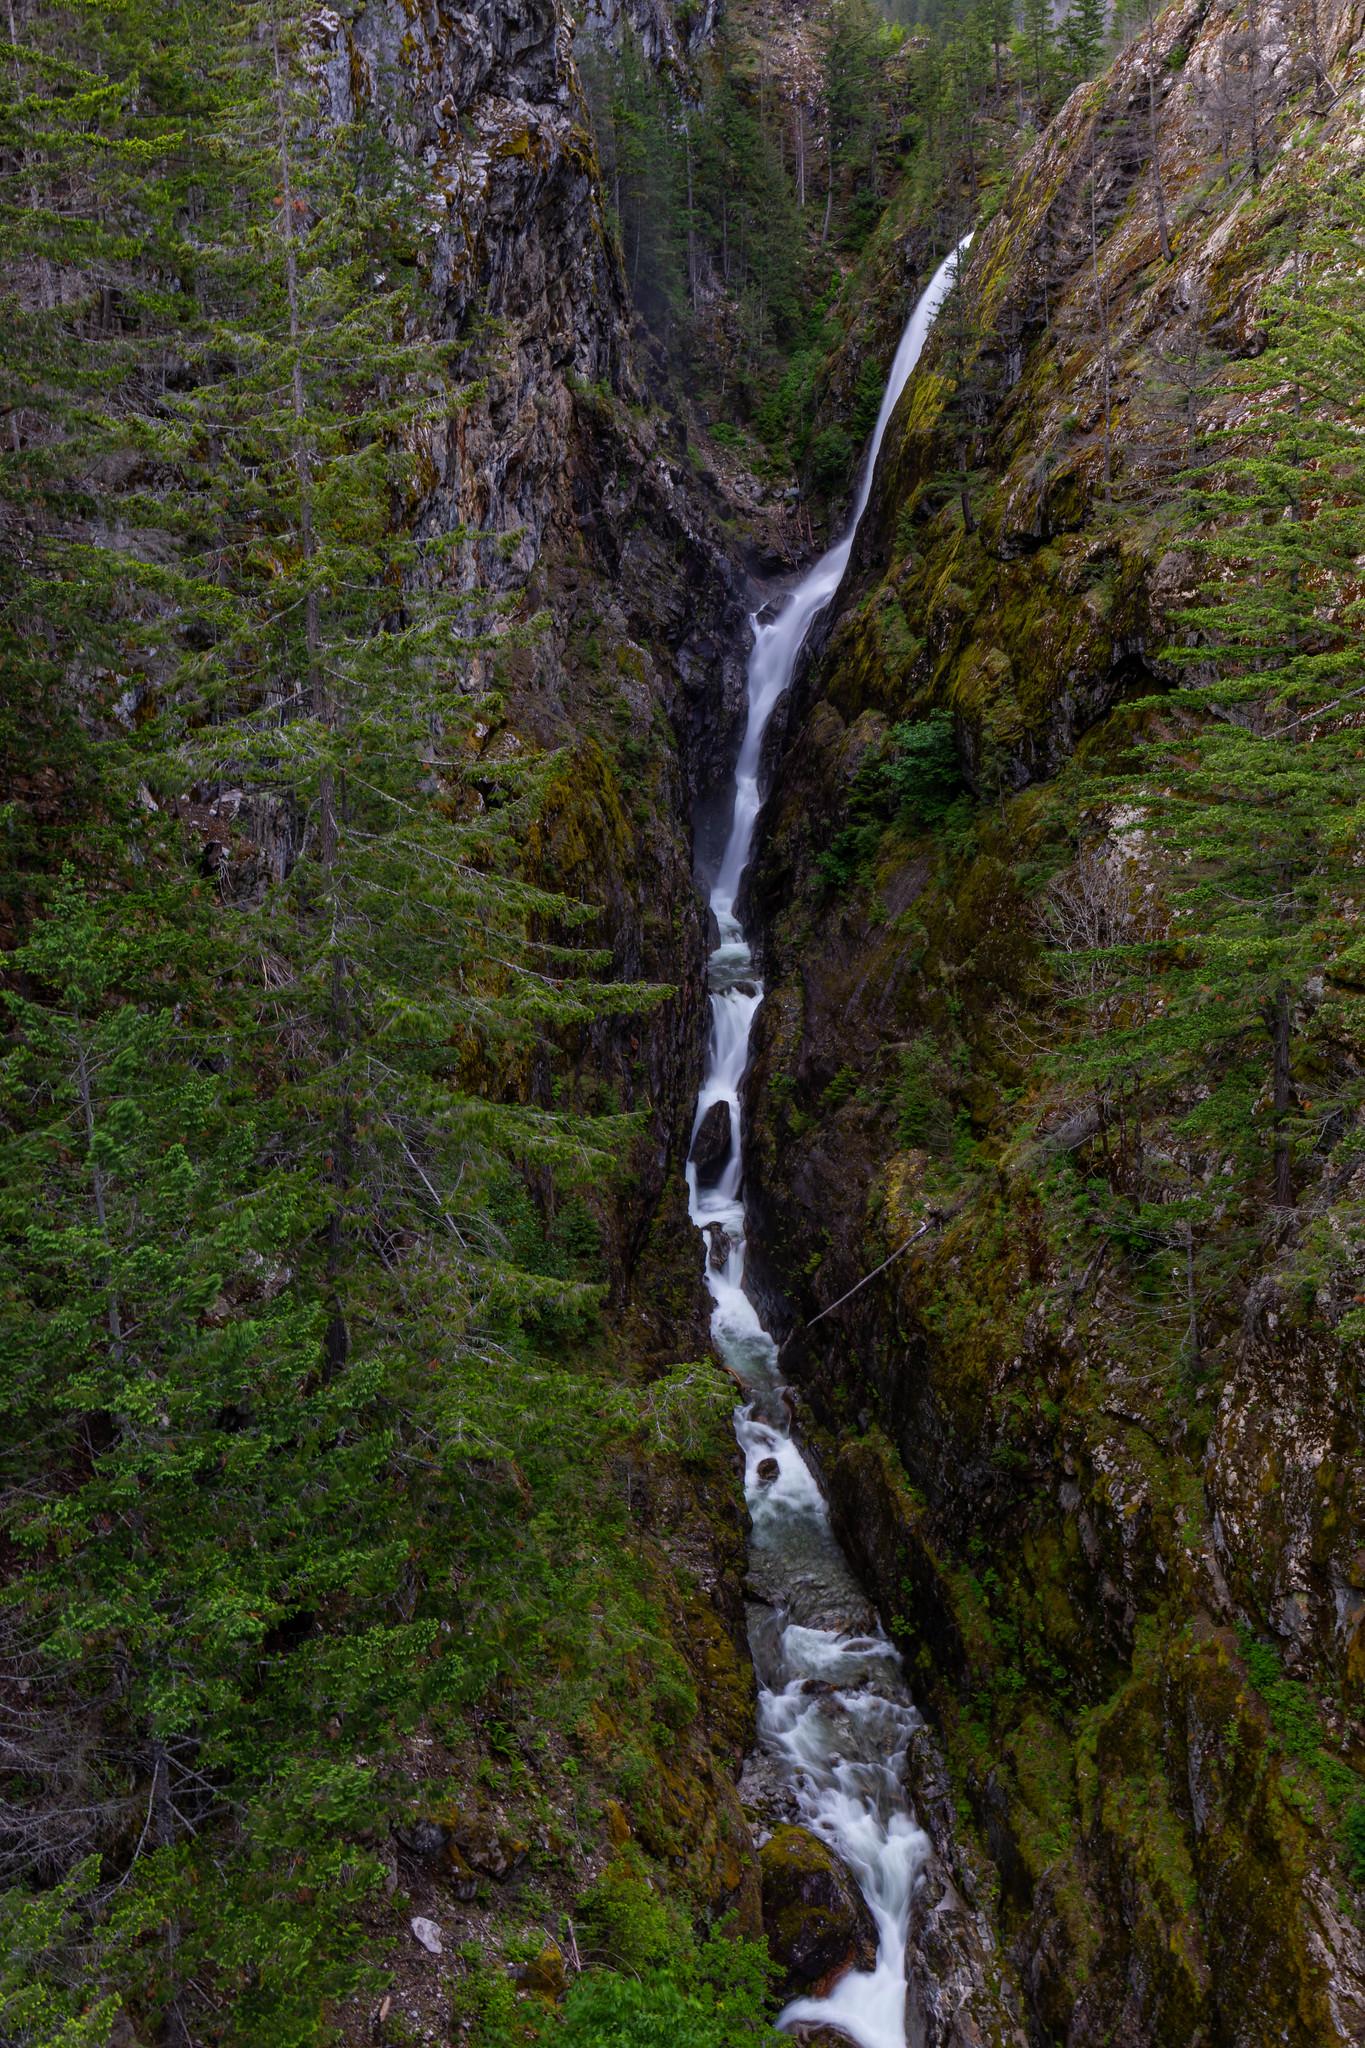 05.26. North Cascades. Gorge Falls